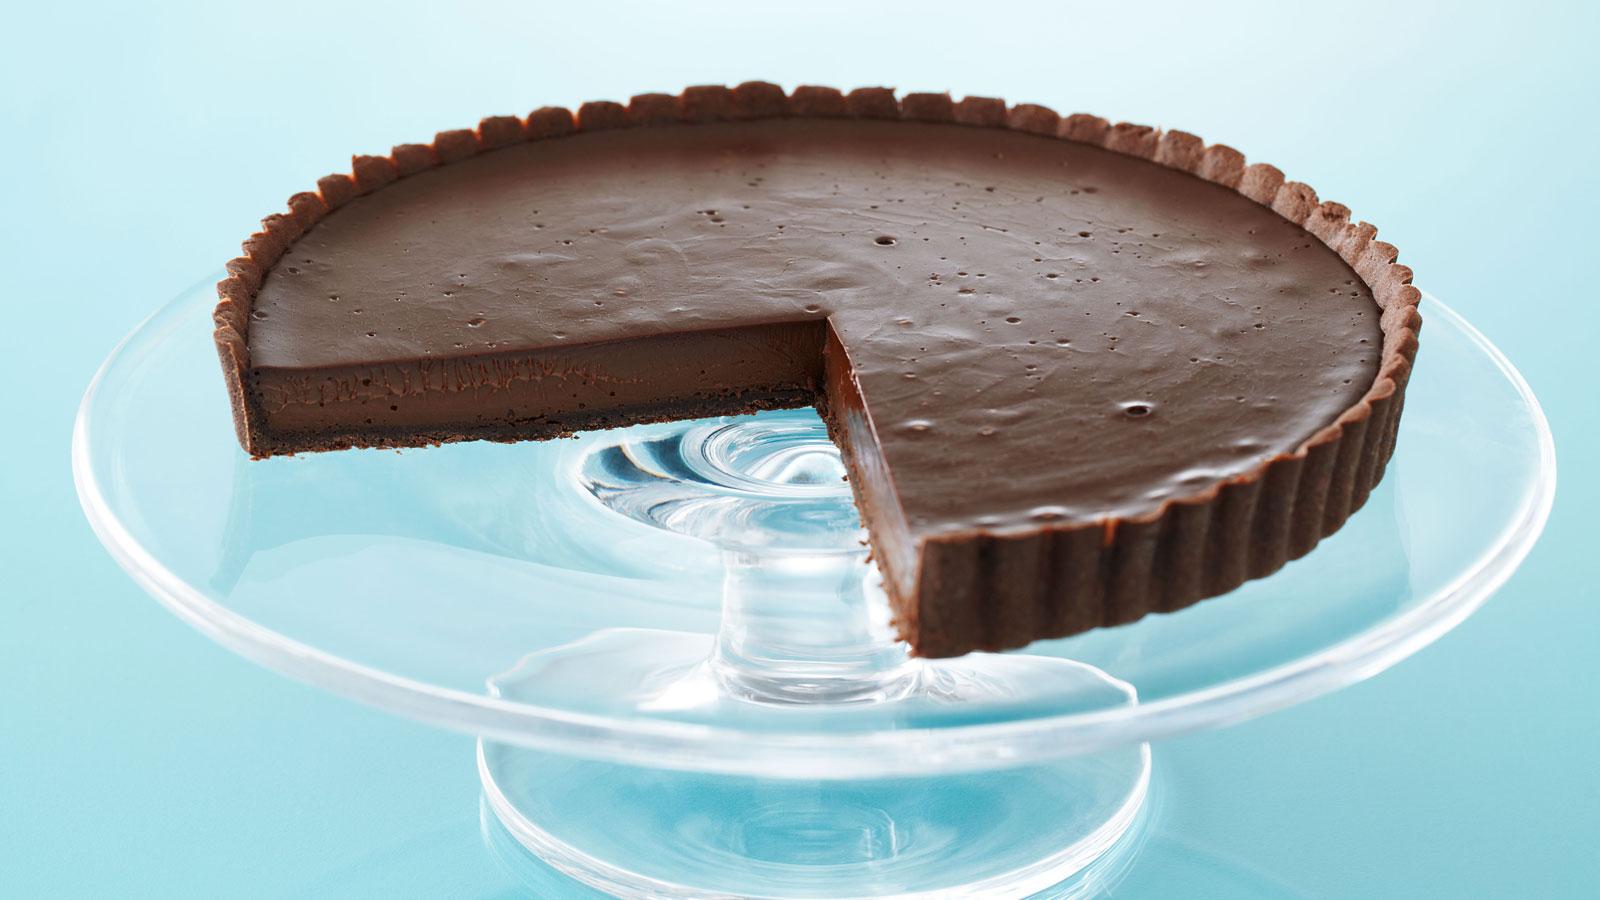 Tarta De Chocolate Tarte Au Chocolat Anna Olson Receta